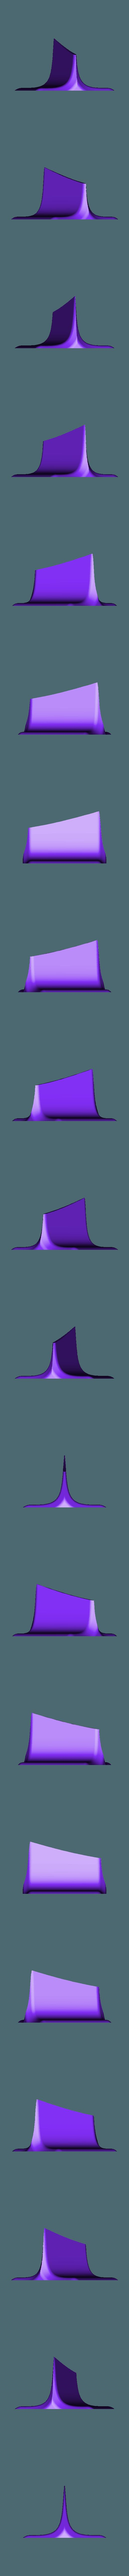 Ailerons_wing_small.stl Download free STL file TBS Capirinha winglets • 3D print design, touchthebitum